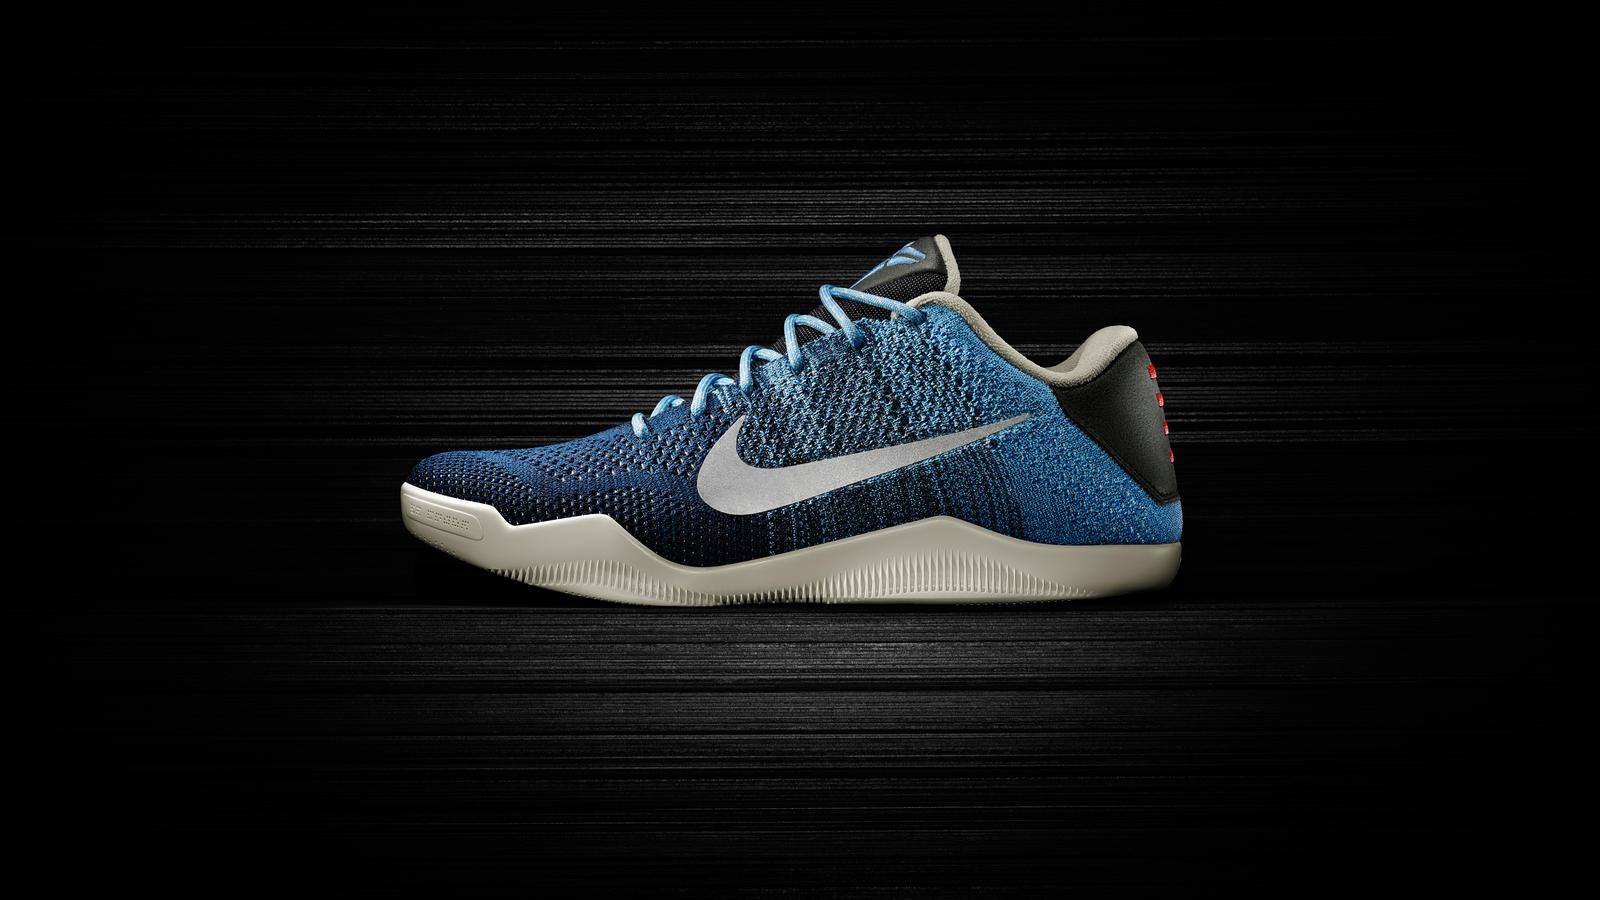 16-130_Nike_Kobe_822675-404_Profile-01